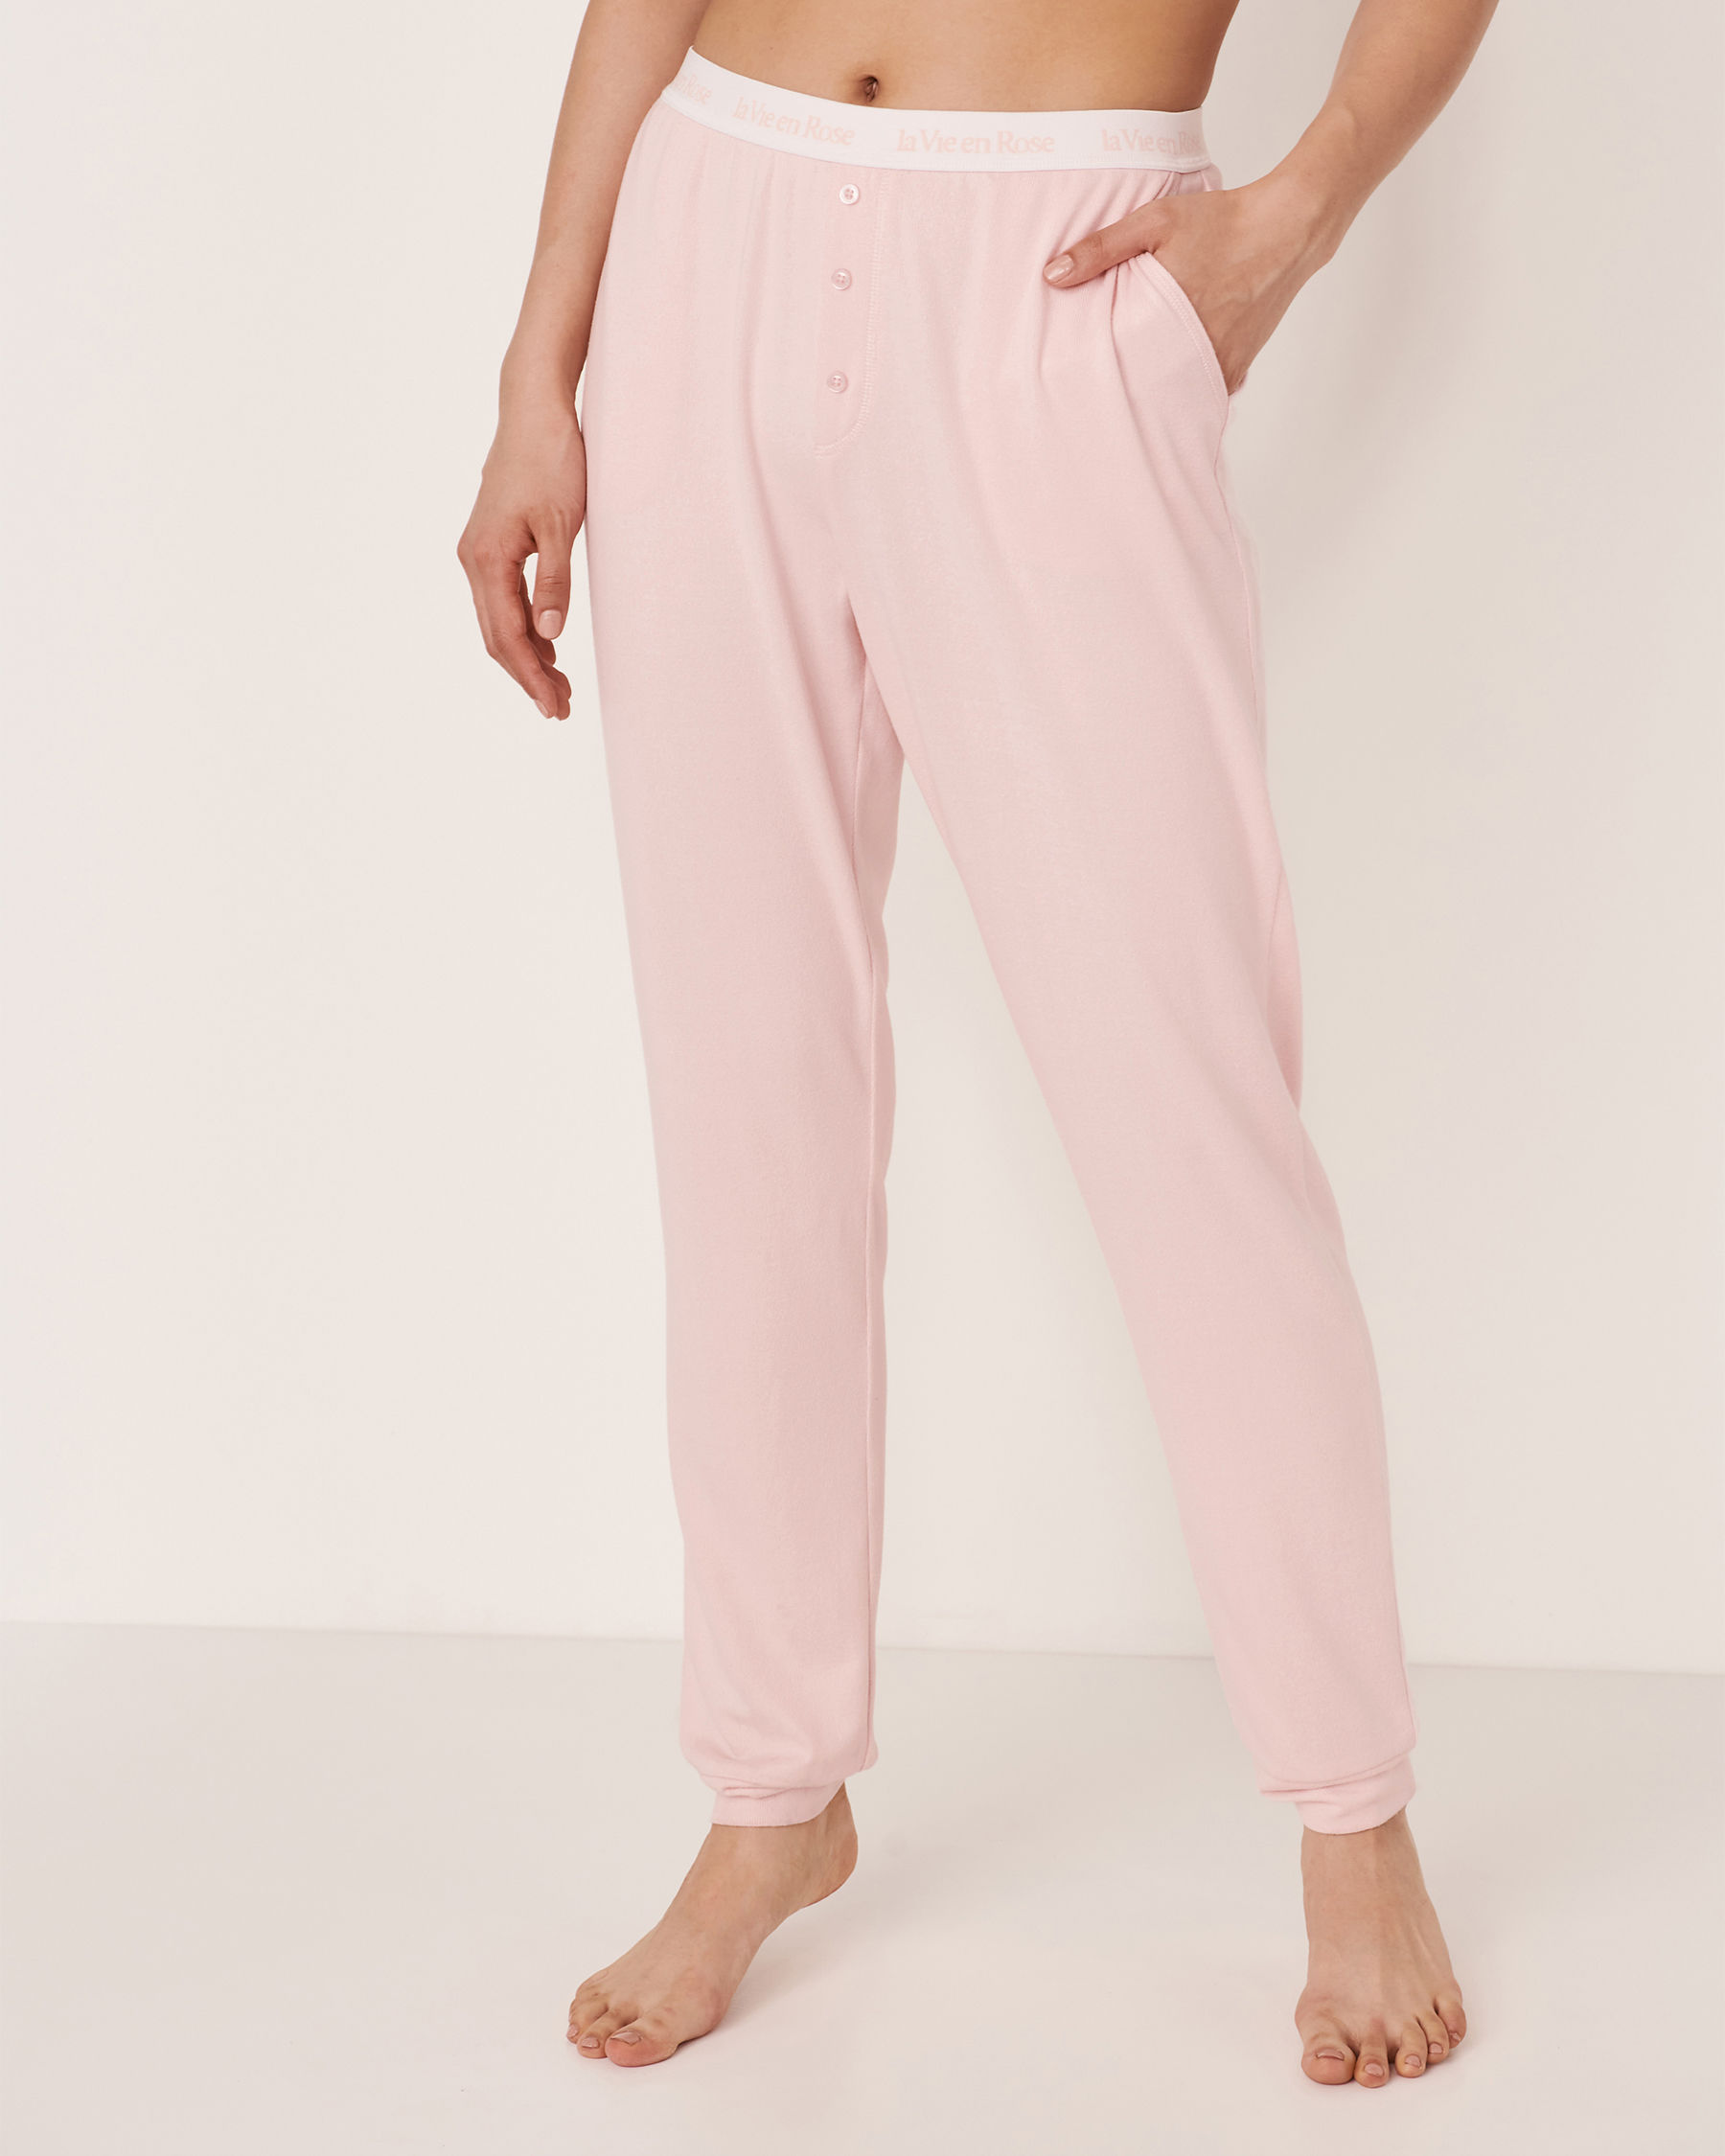 LA VIE EN ROSE Recycled Fibers Pyjama Pant Light pink 40200088 - View1